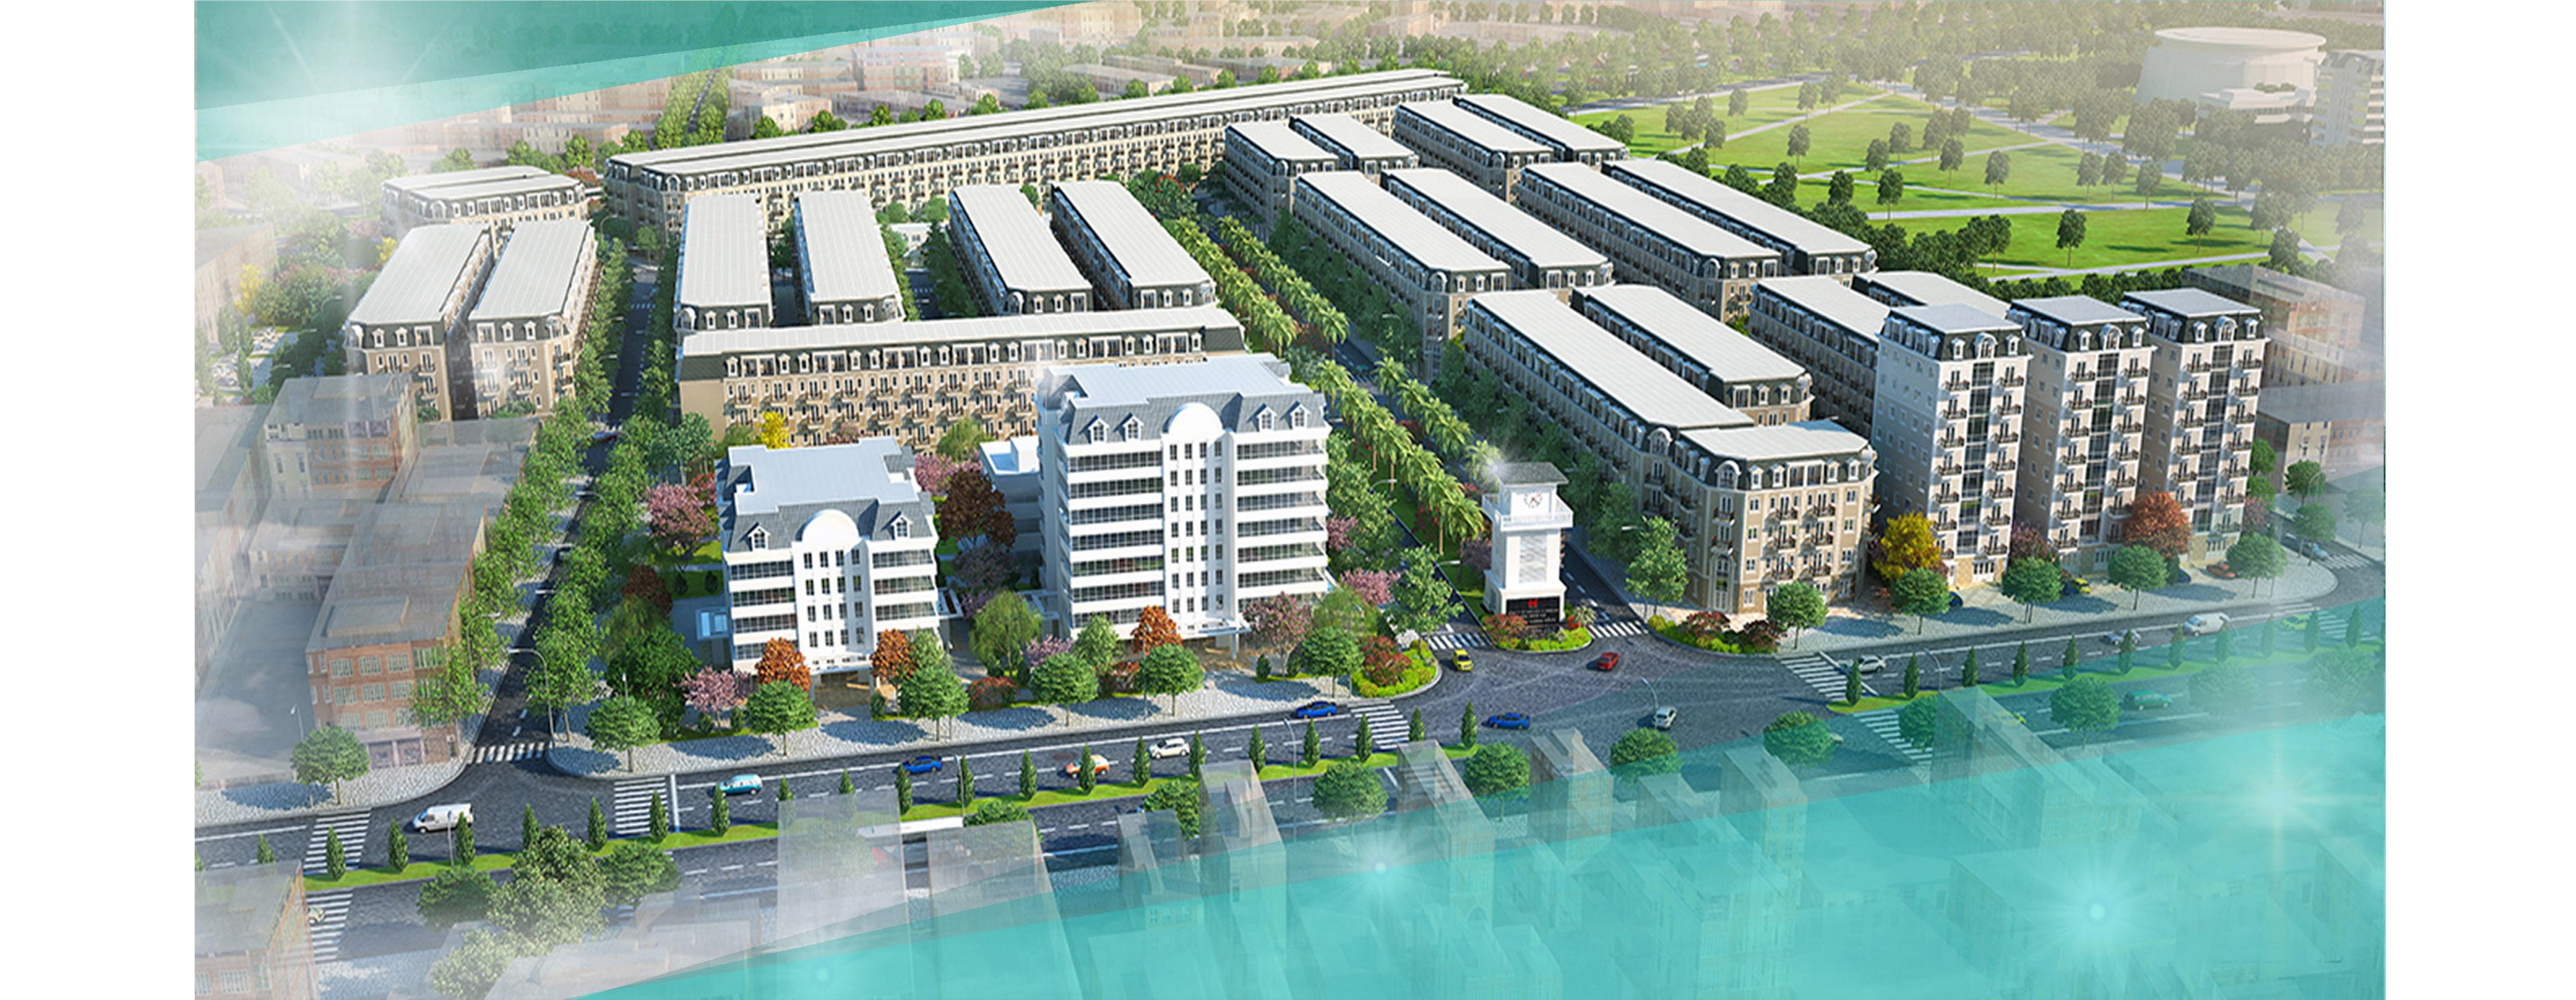 http://newlandgroup.vn/khu-dan-cu-nguyen-luong-bang